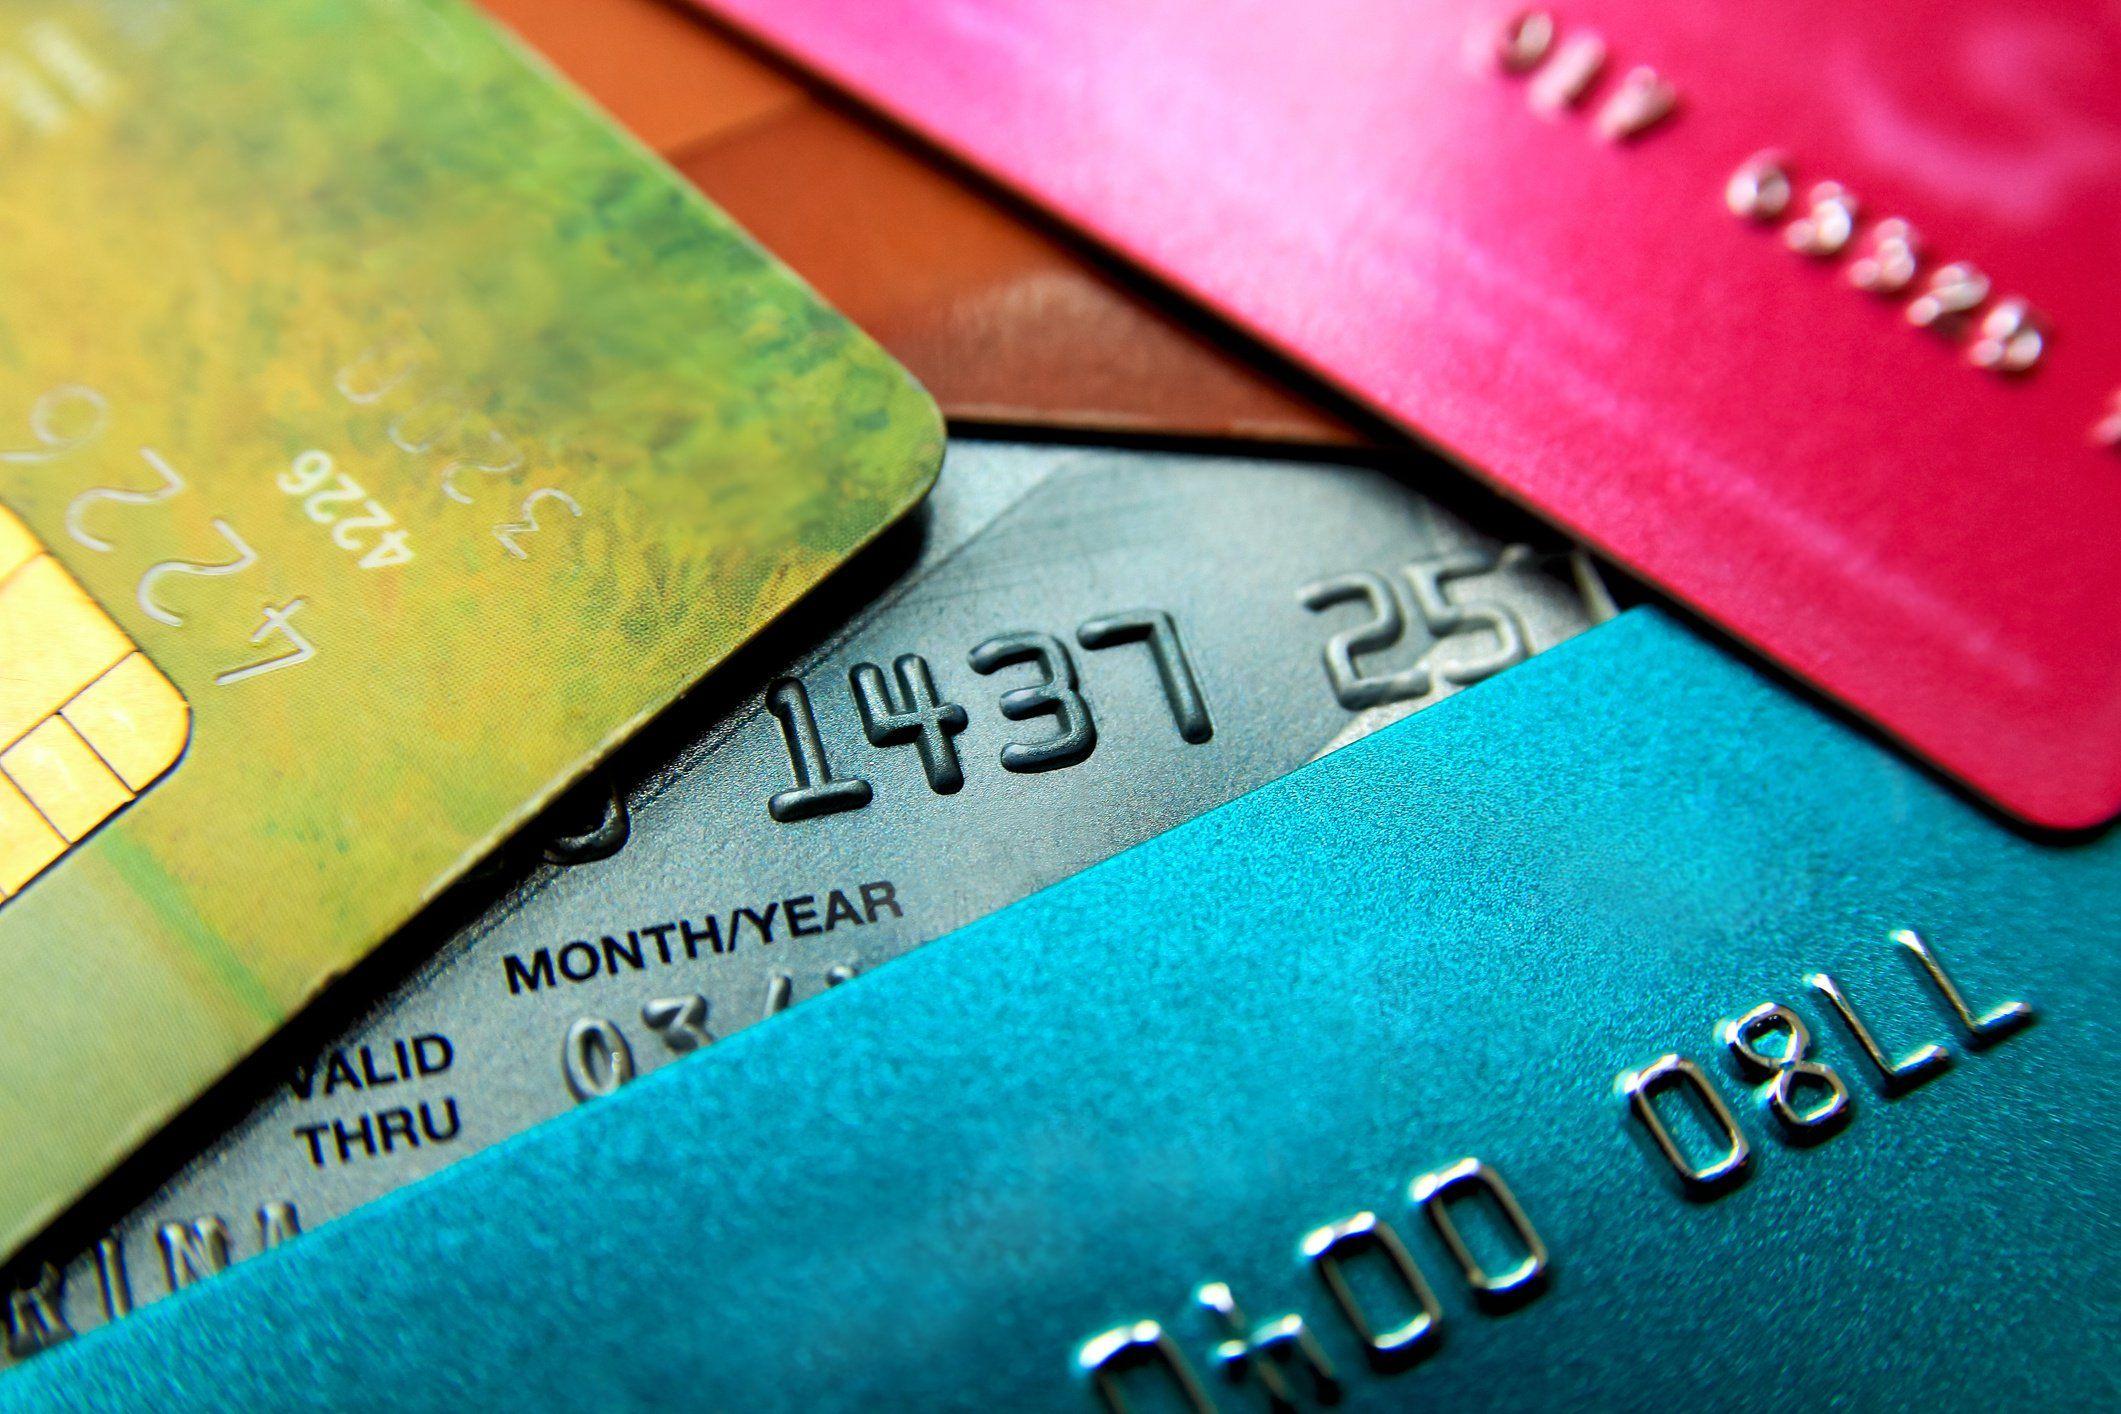 kreditnaya-karta-s-ploxoj-kreditnoj-istoriej_4